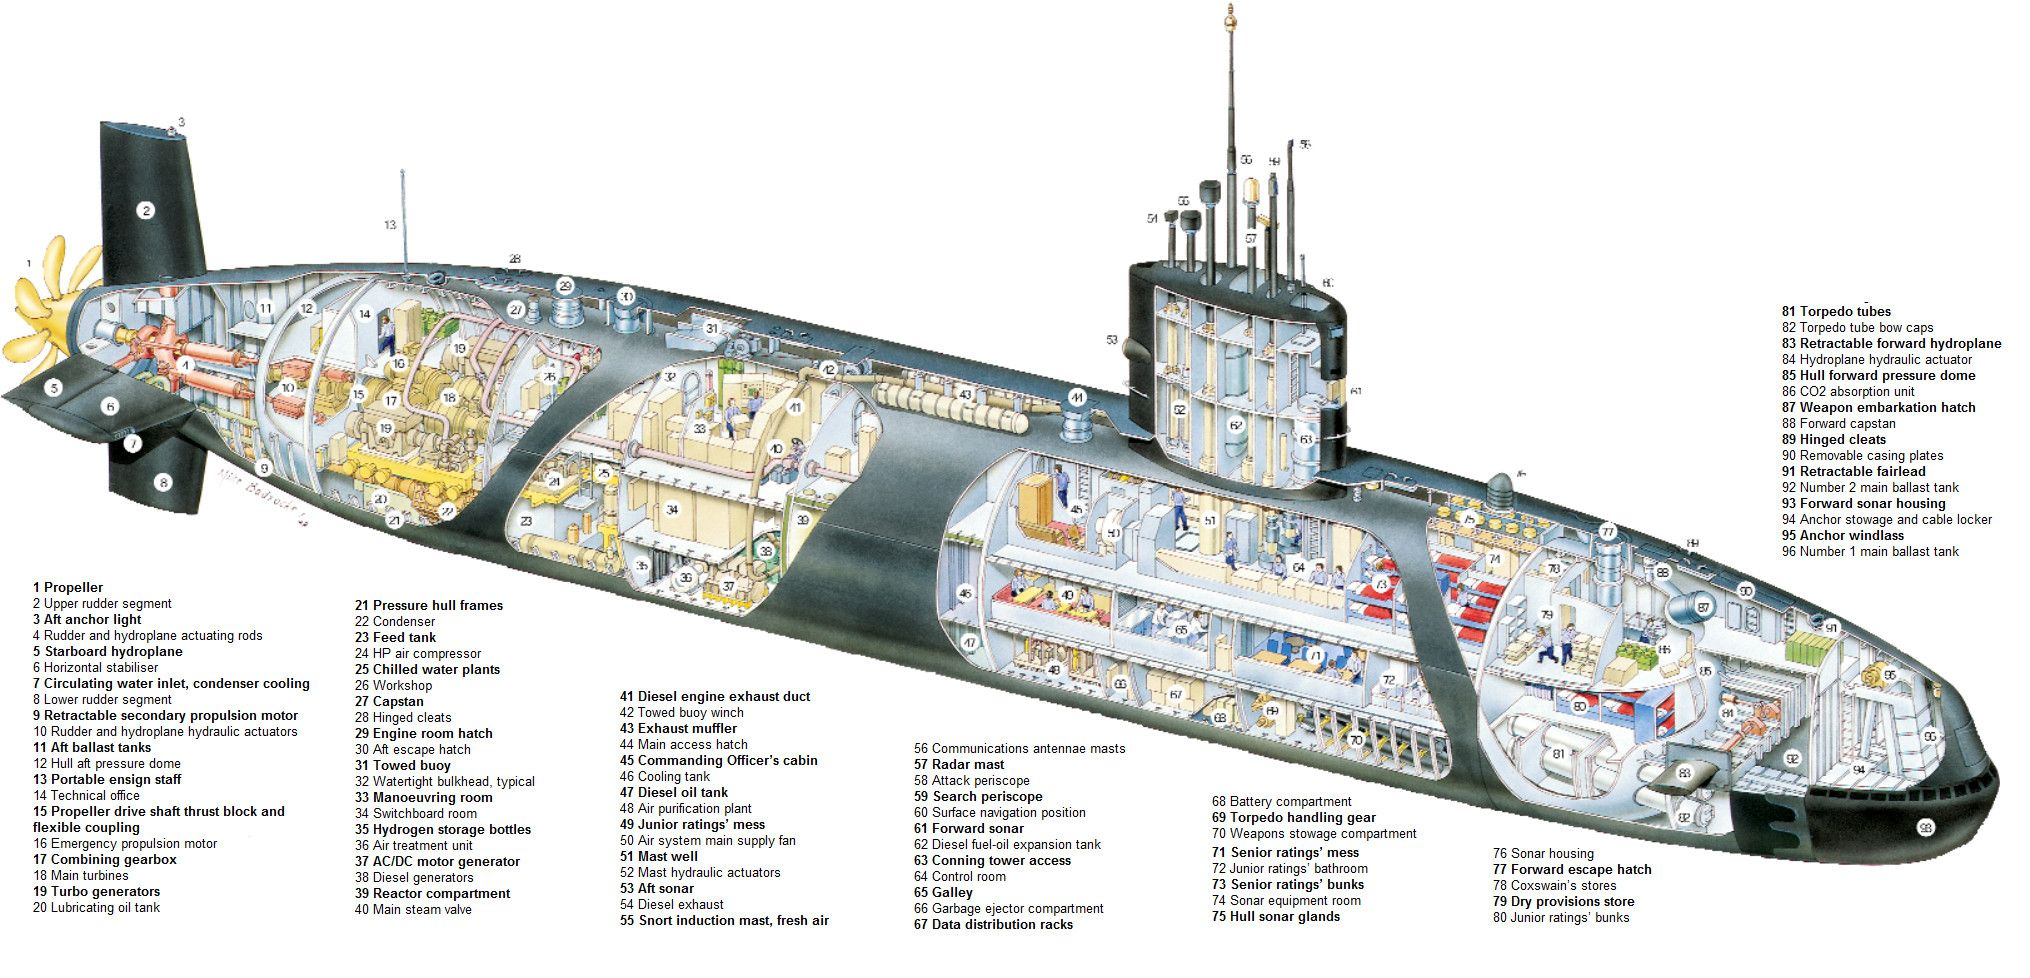 hight resolution of trafalgar class submarine cutaway